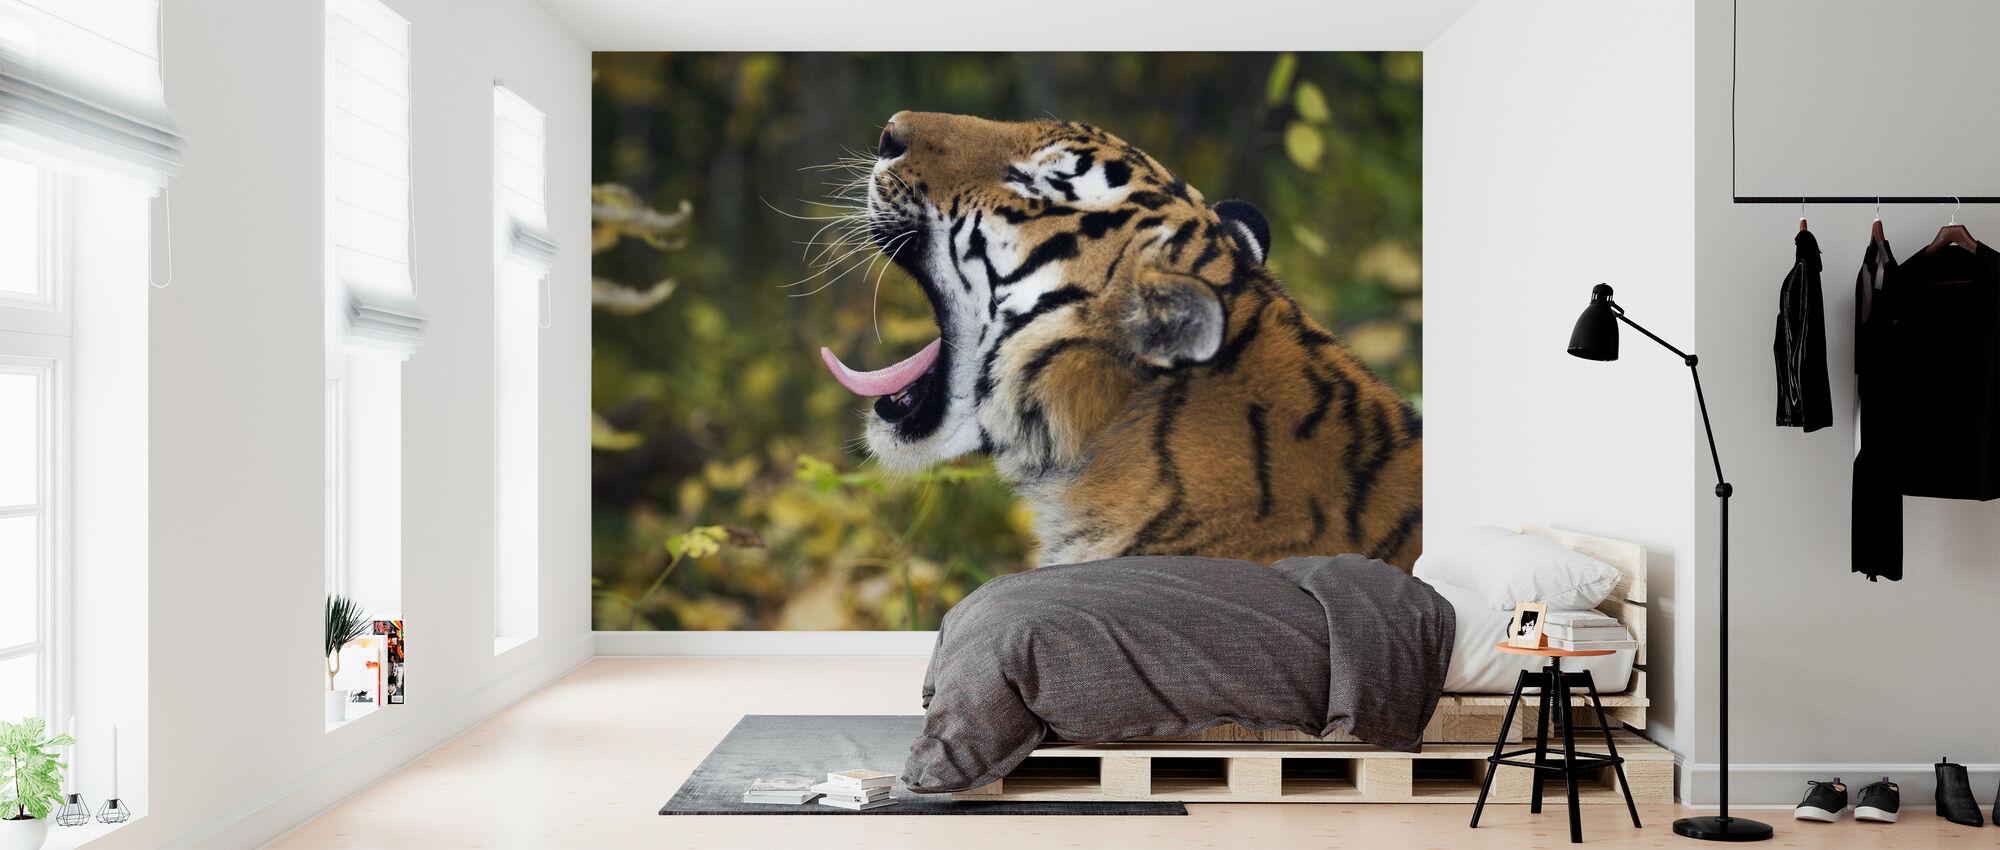 Yawning Siberian Tiger - Wallpaper - Bedroom